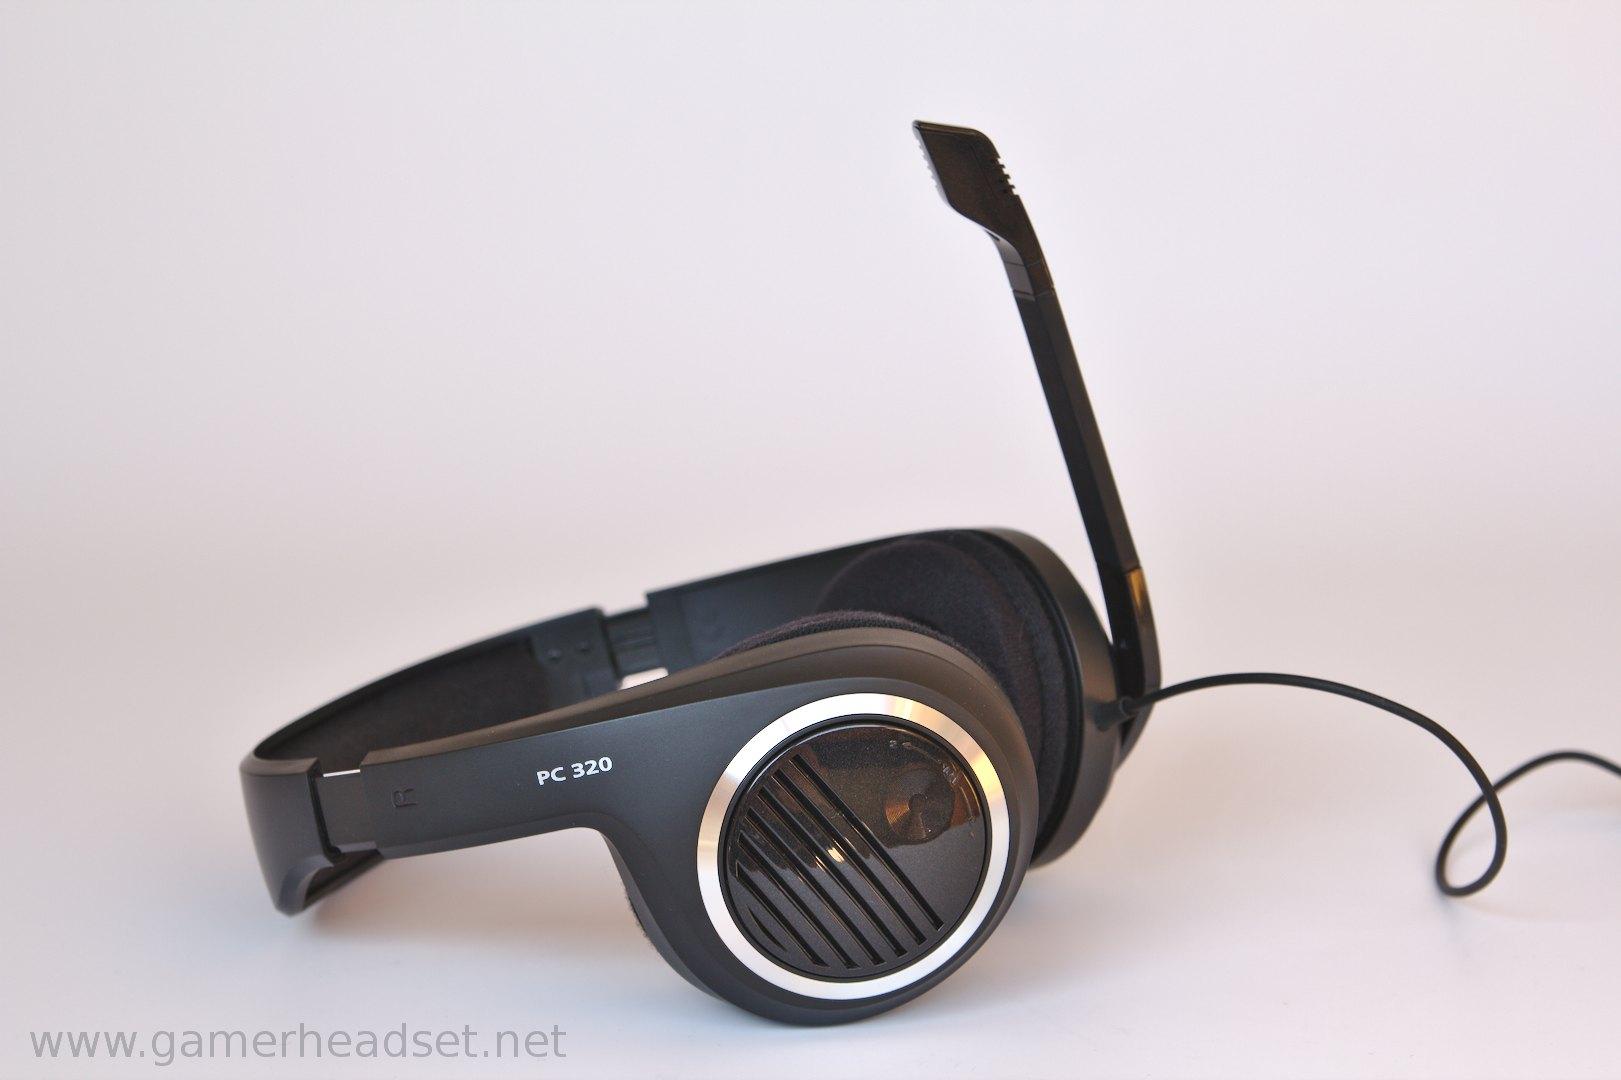 a7bee83d68e Sennheiser PC 320 im Test   Gamer Headset